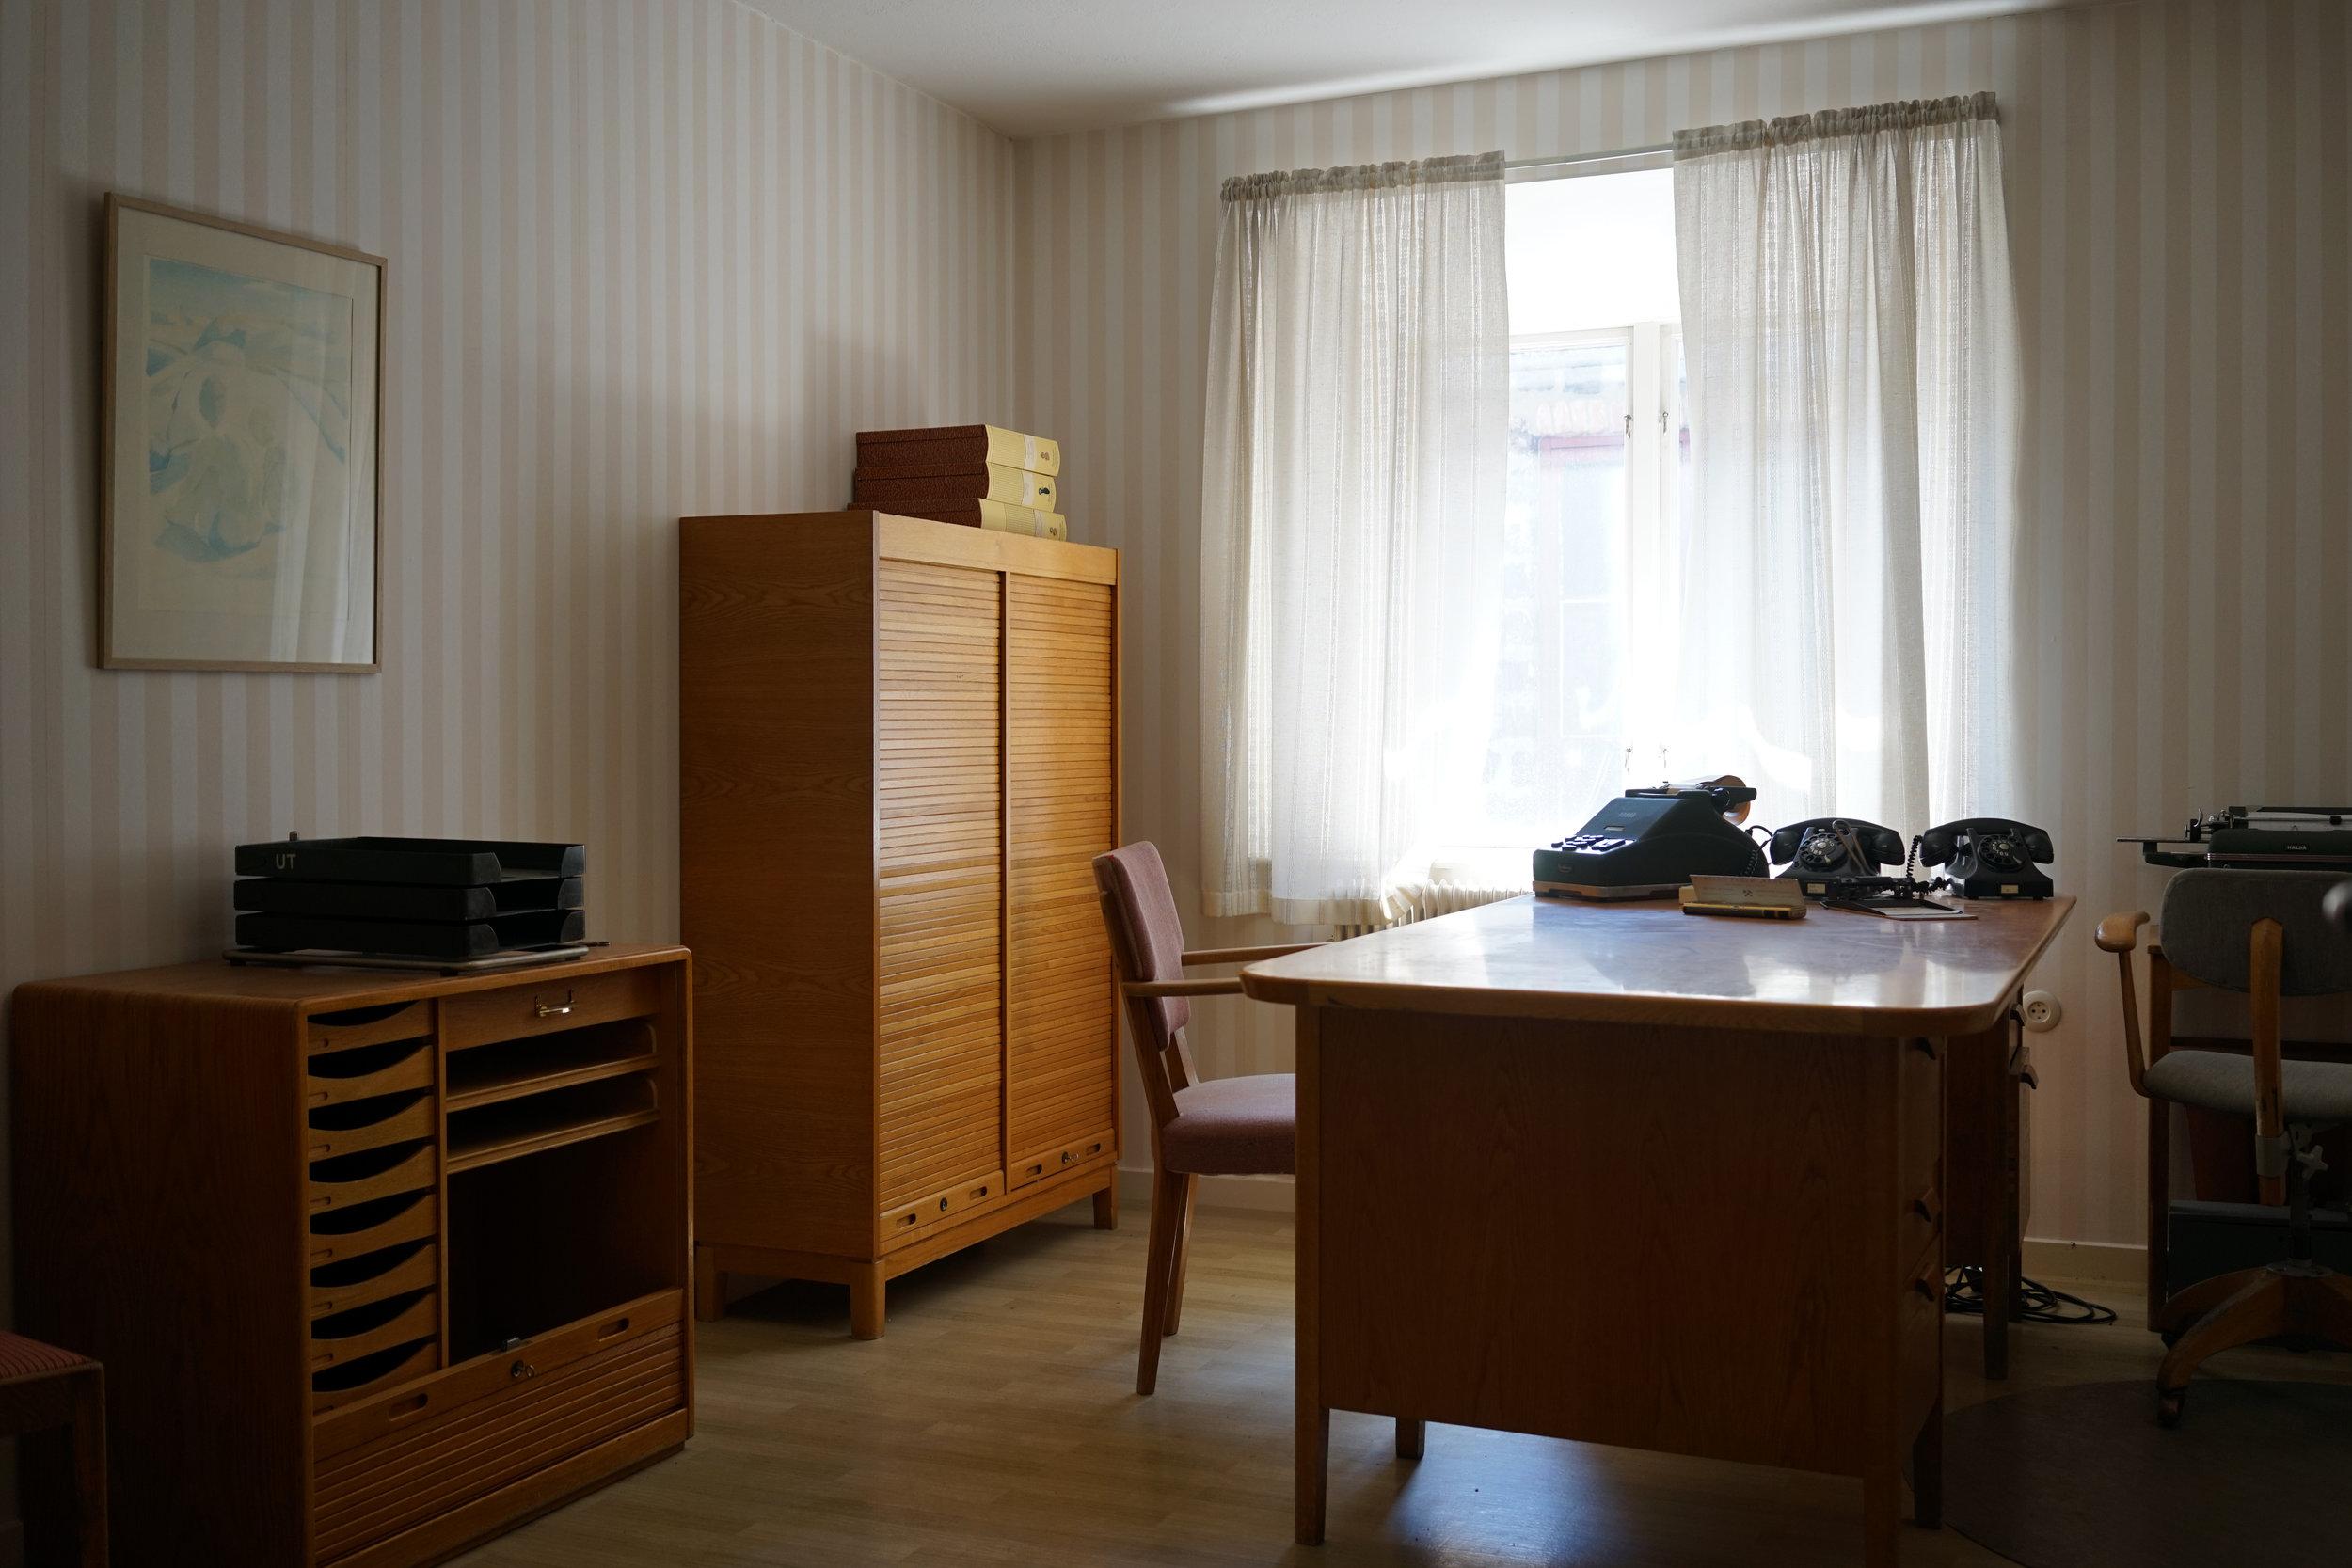 kontor9.jpg